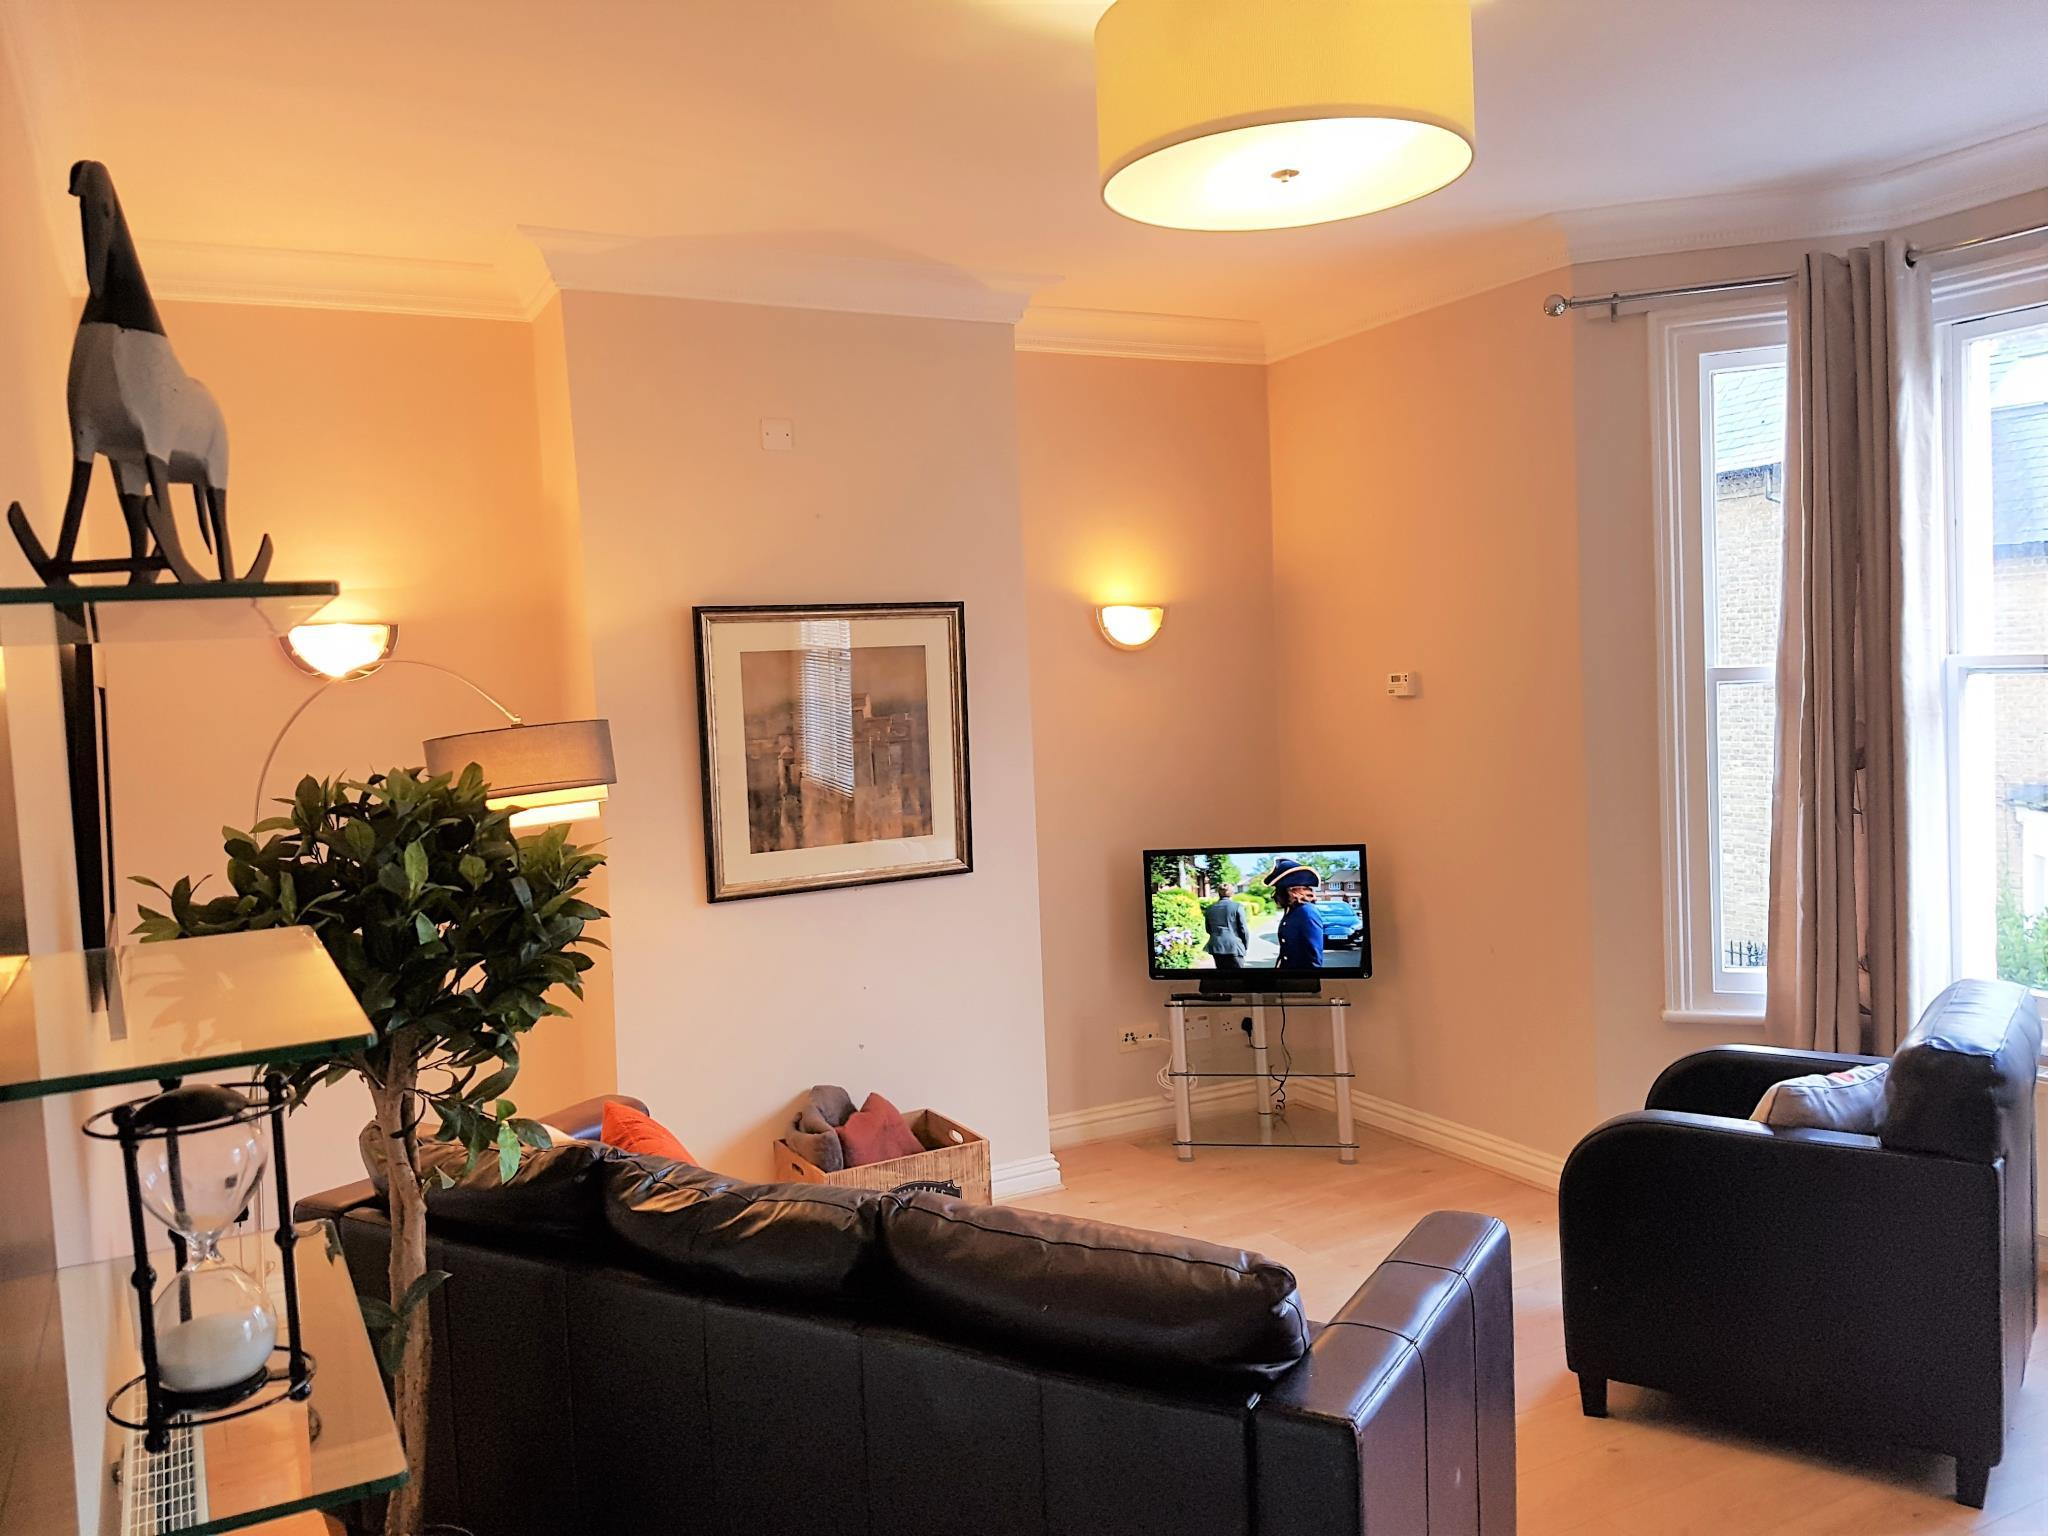 Norwich Street Apartments (Peymans), Cambridgeshire